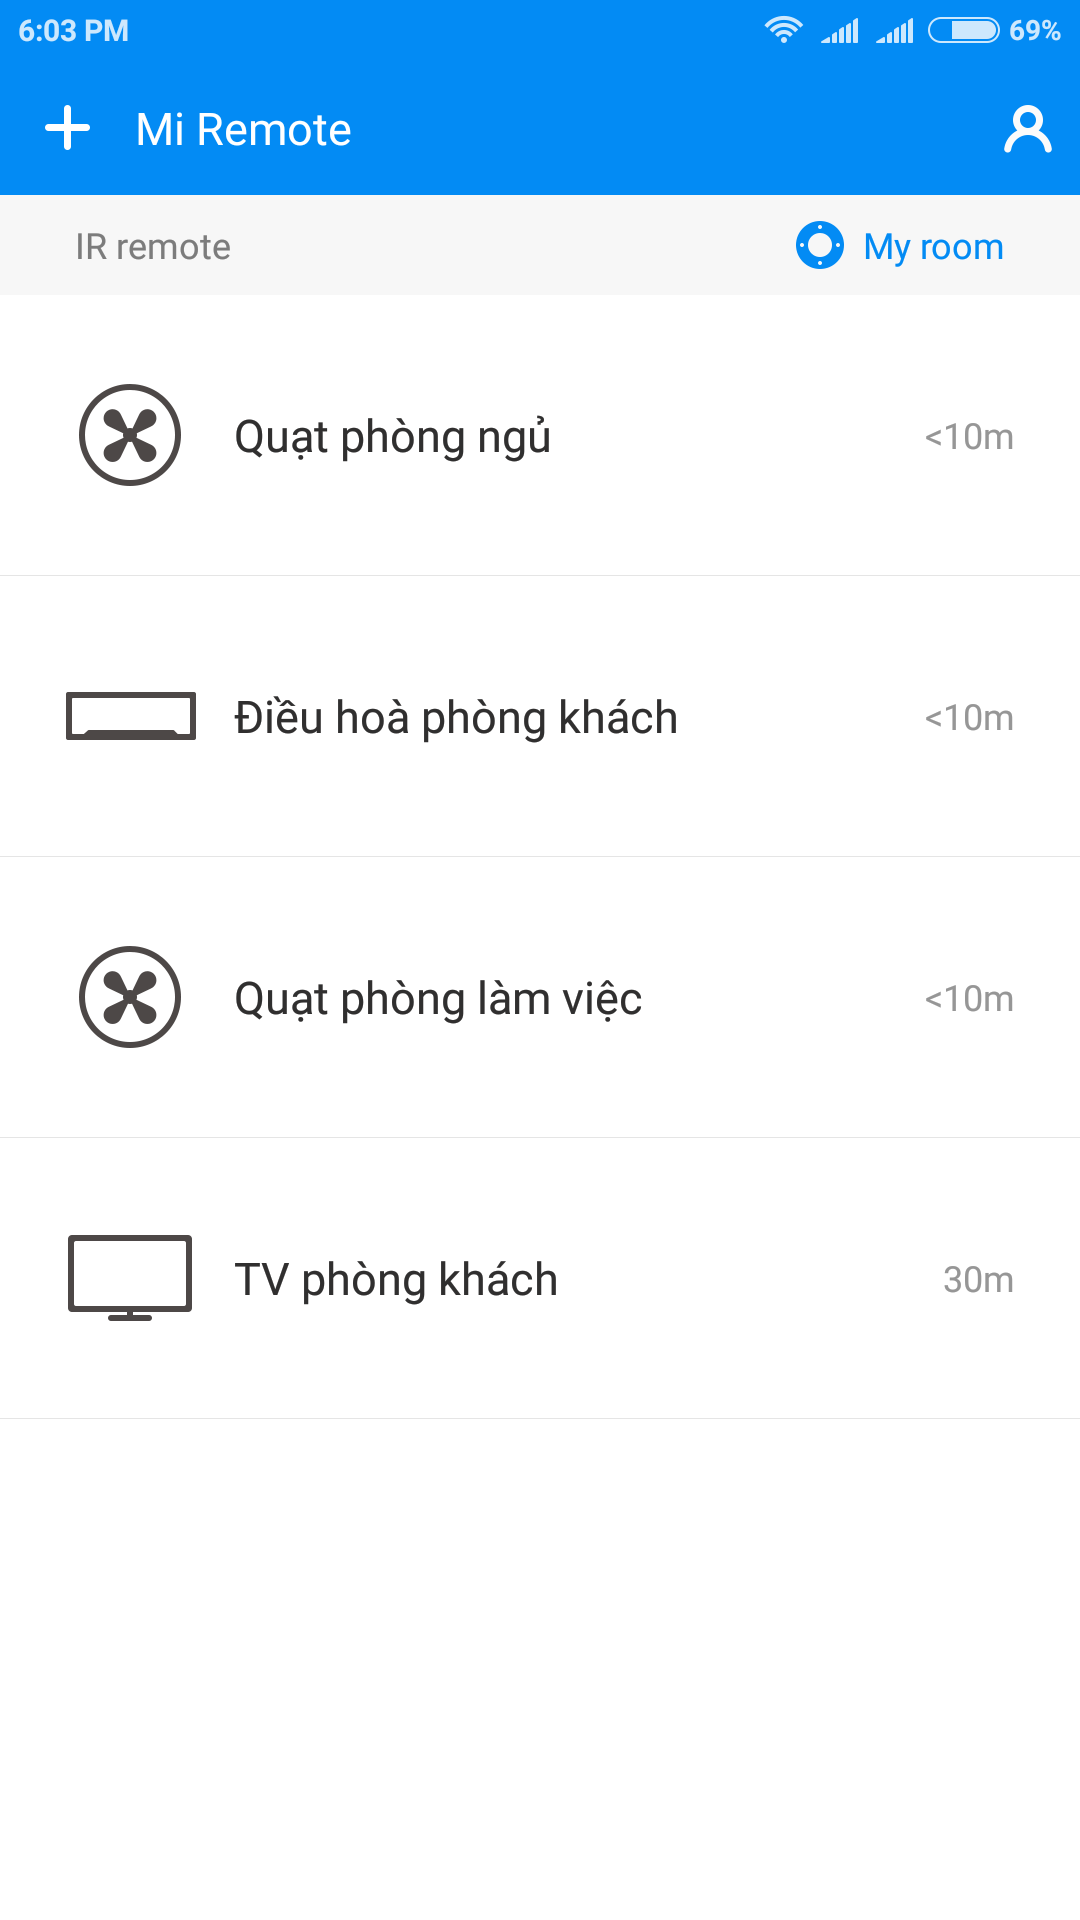 Screenshot_2017-05-09-18-03-43-497_com.duokan.phone.remotecontroller.png